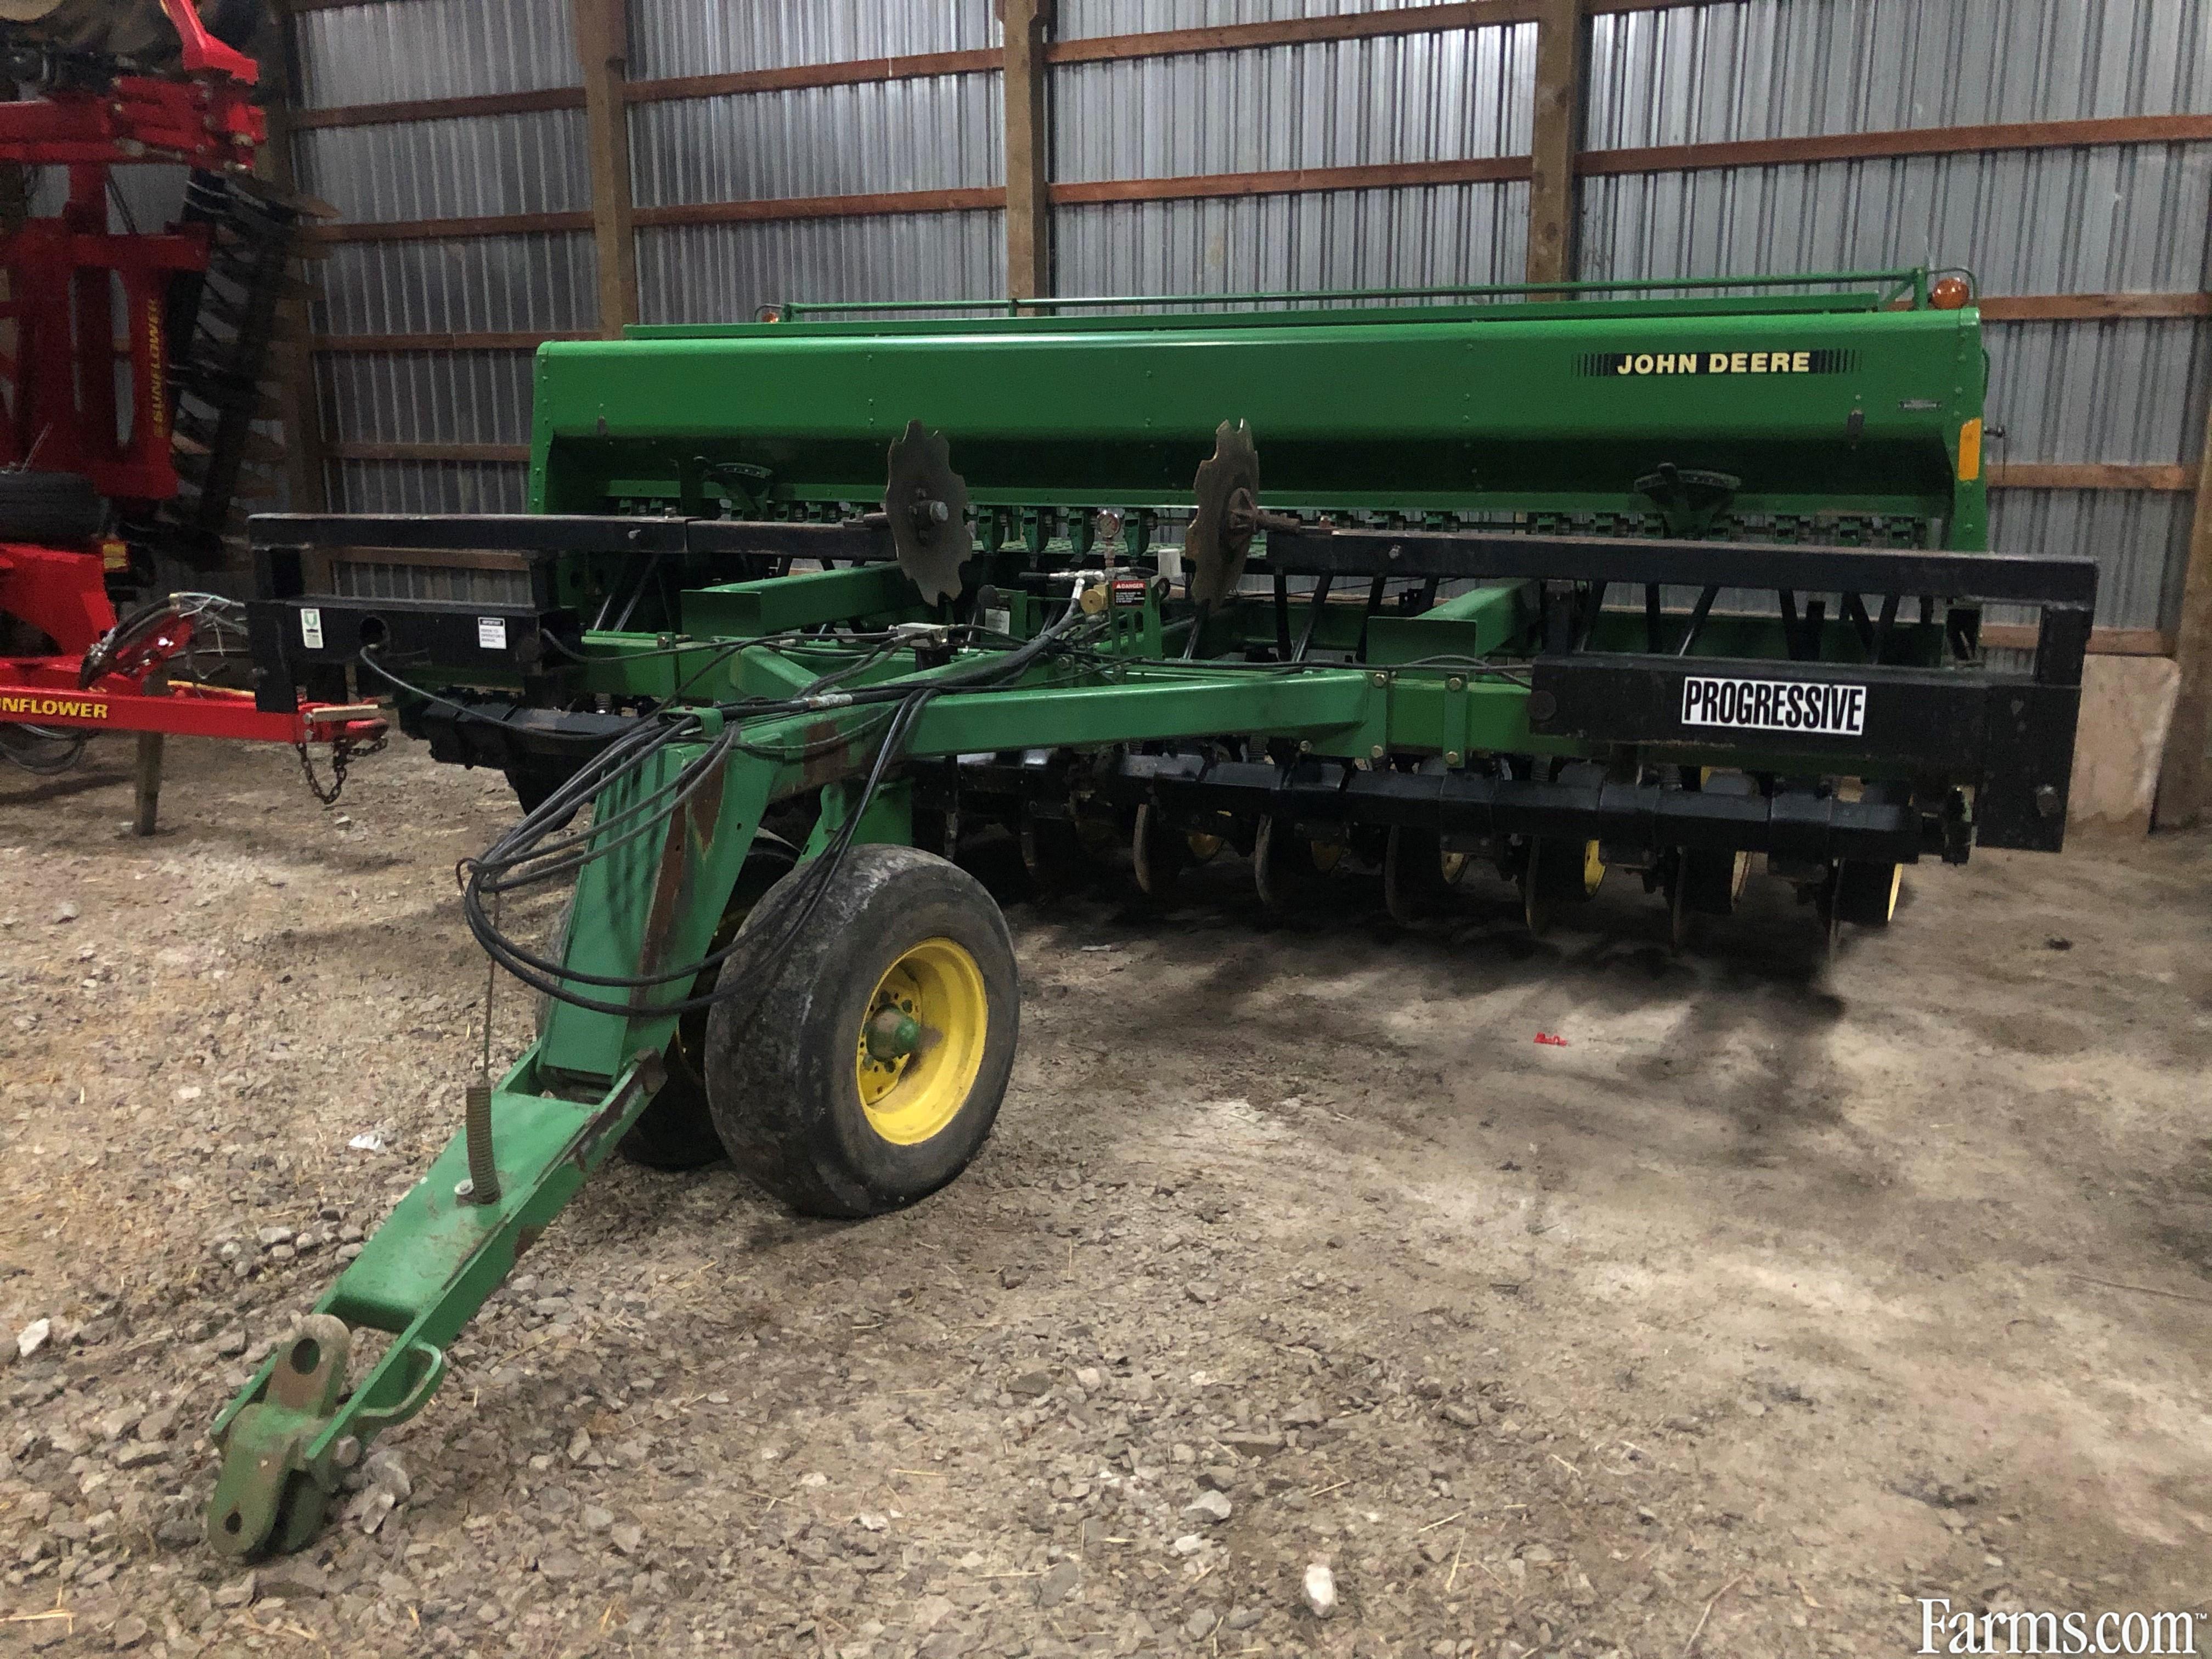 John Deere 750 Planters